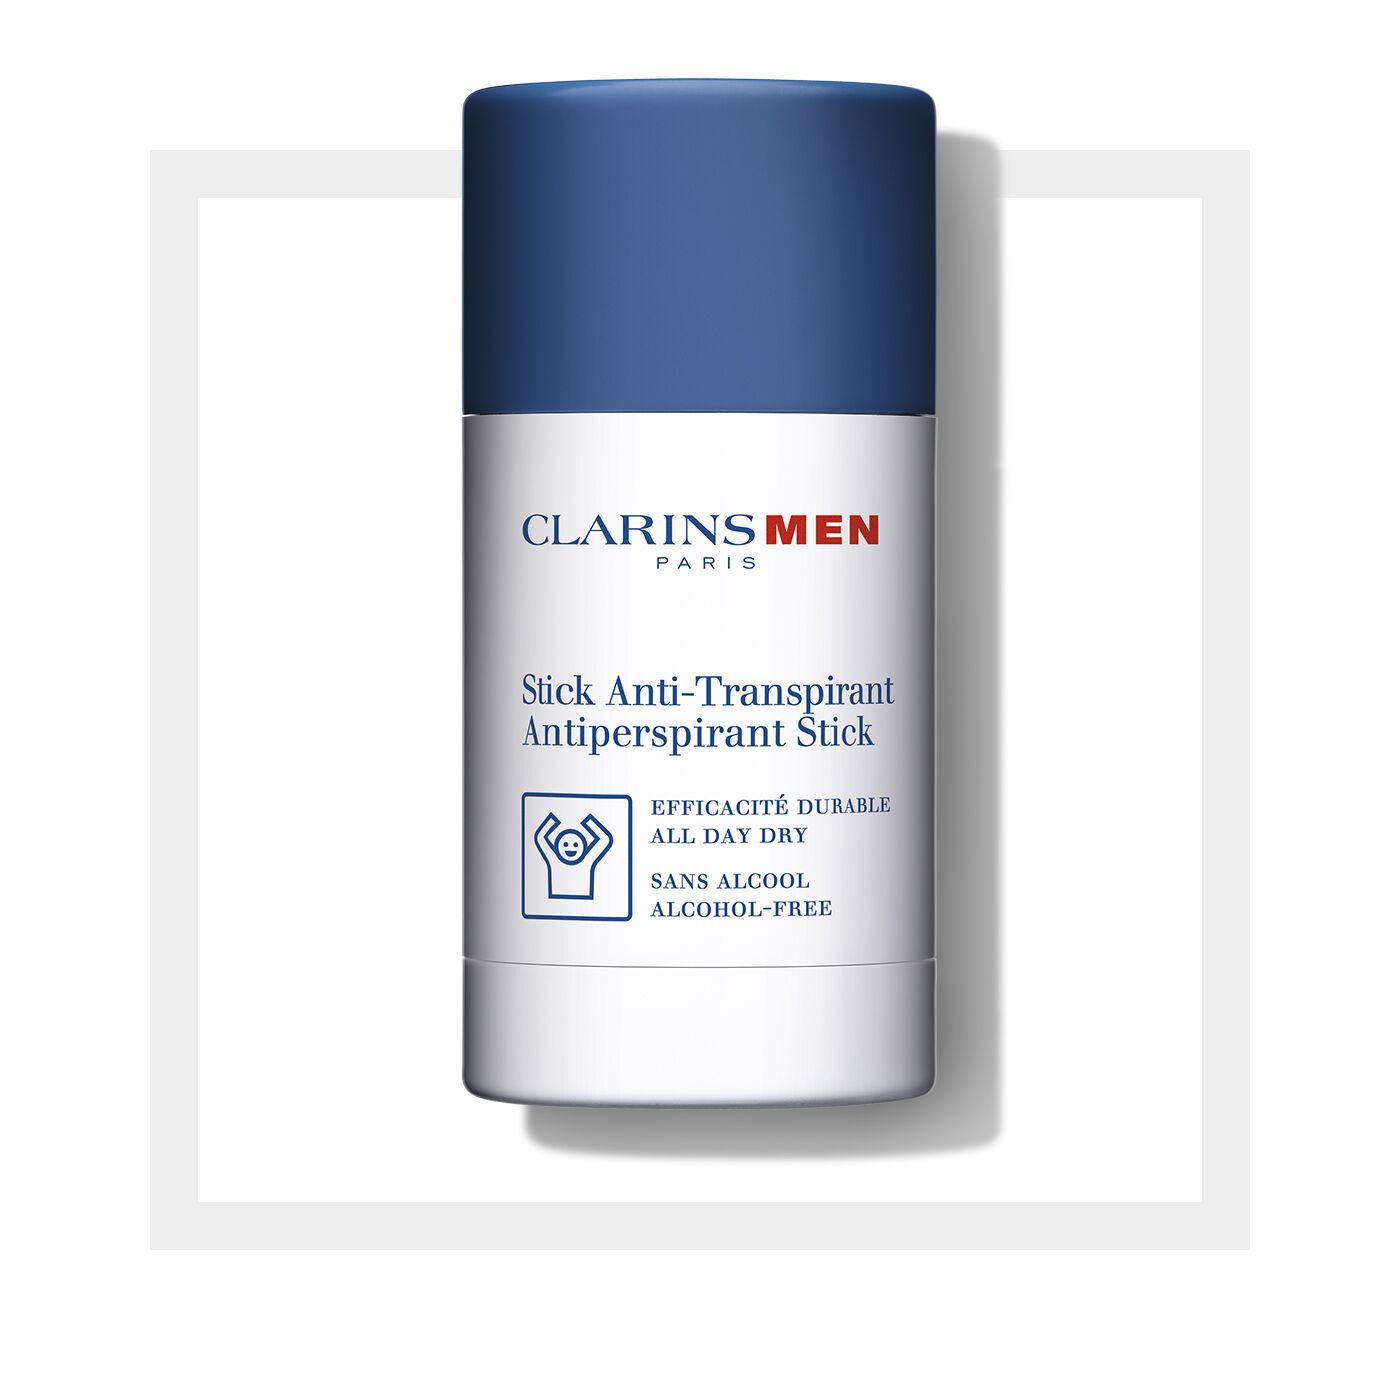 Anti-Transpirant%20Deo%20Stick%20ClarinsMen